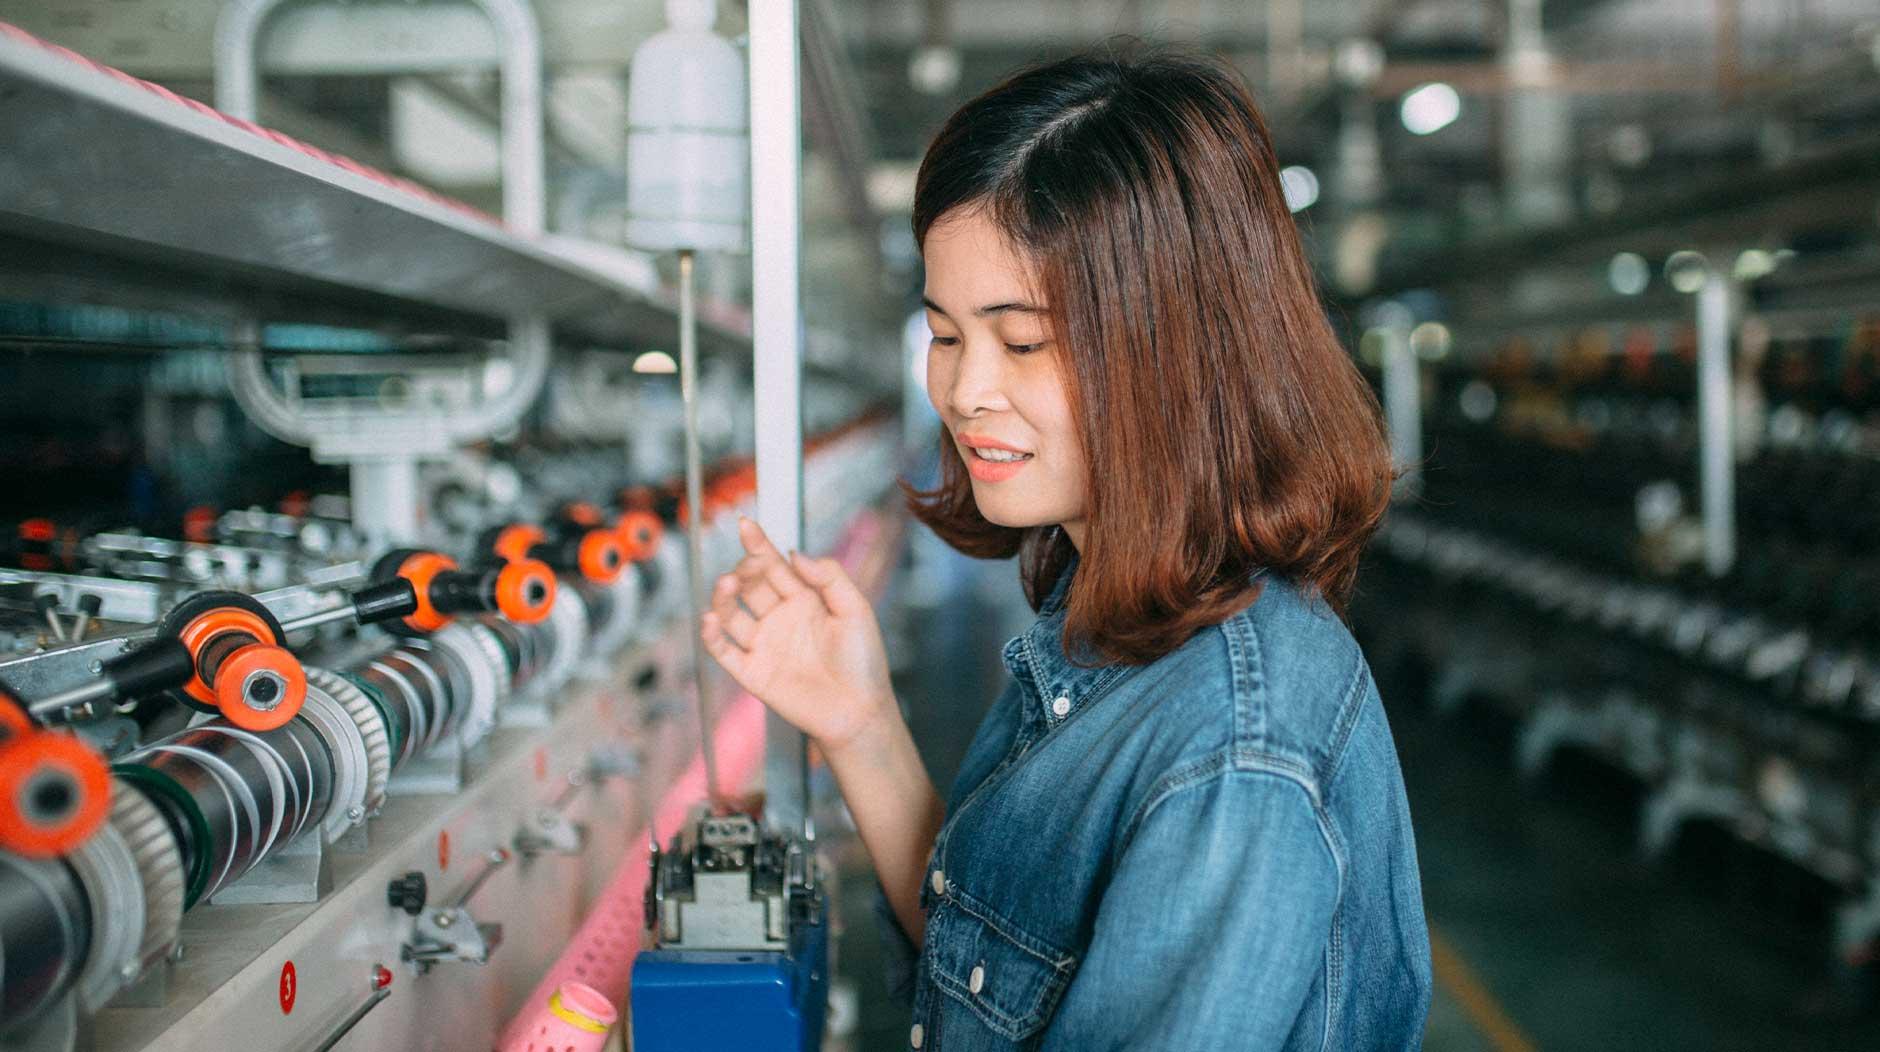 Girl working in a denim fabric manufacturer